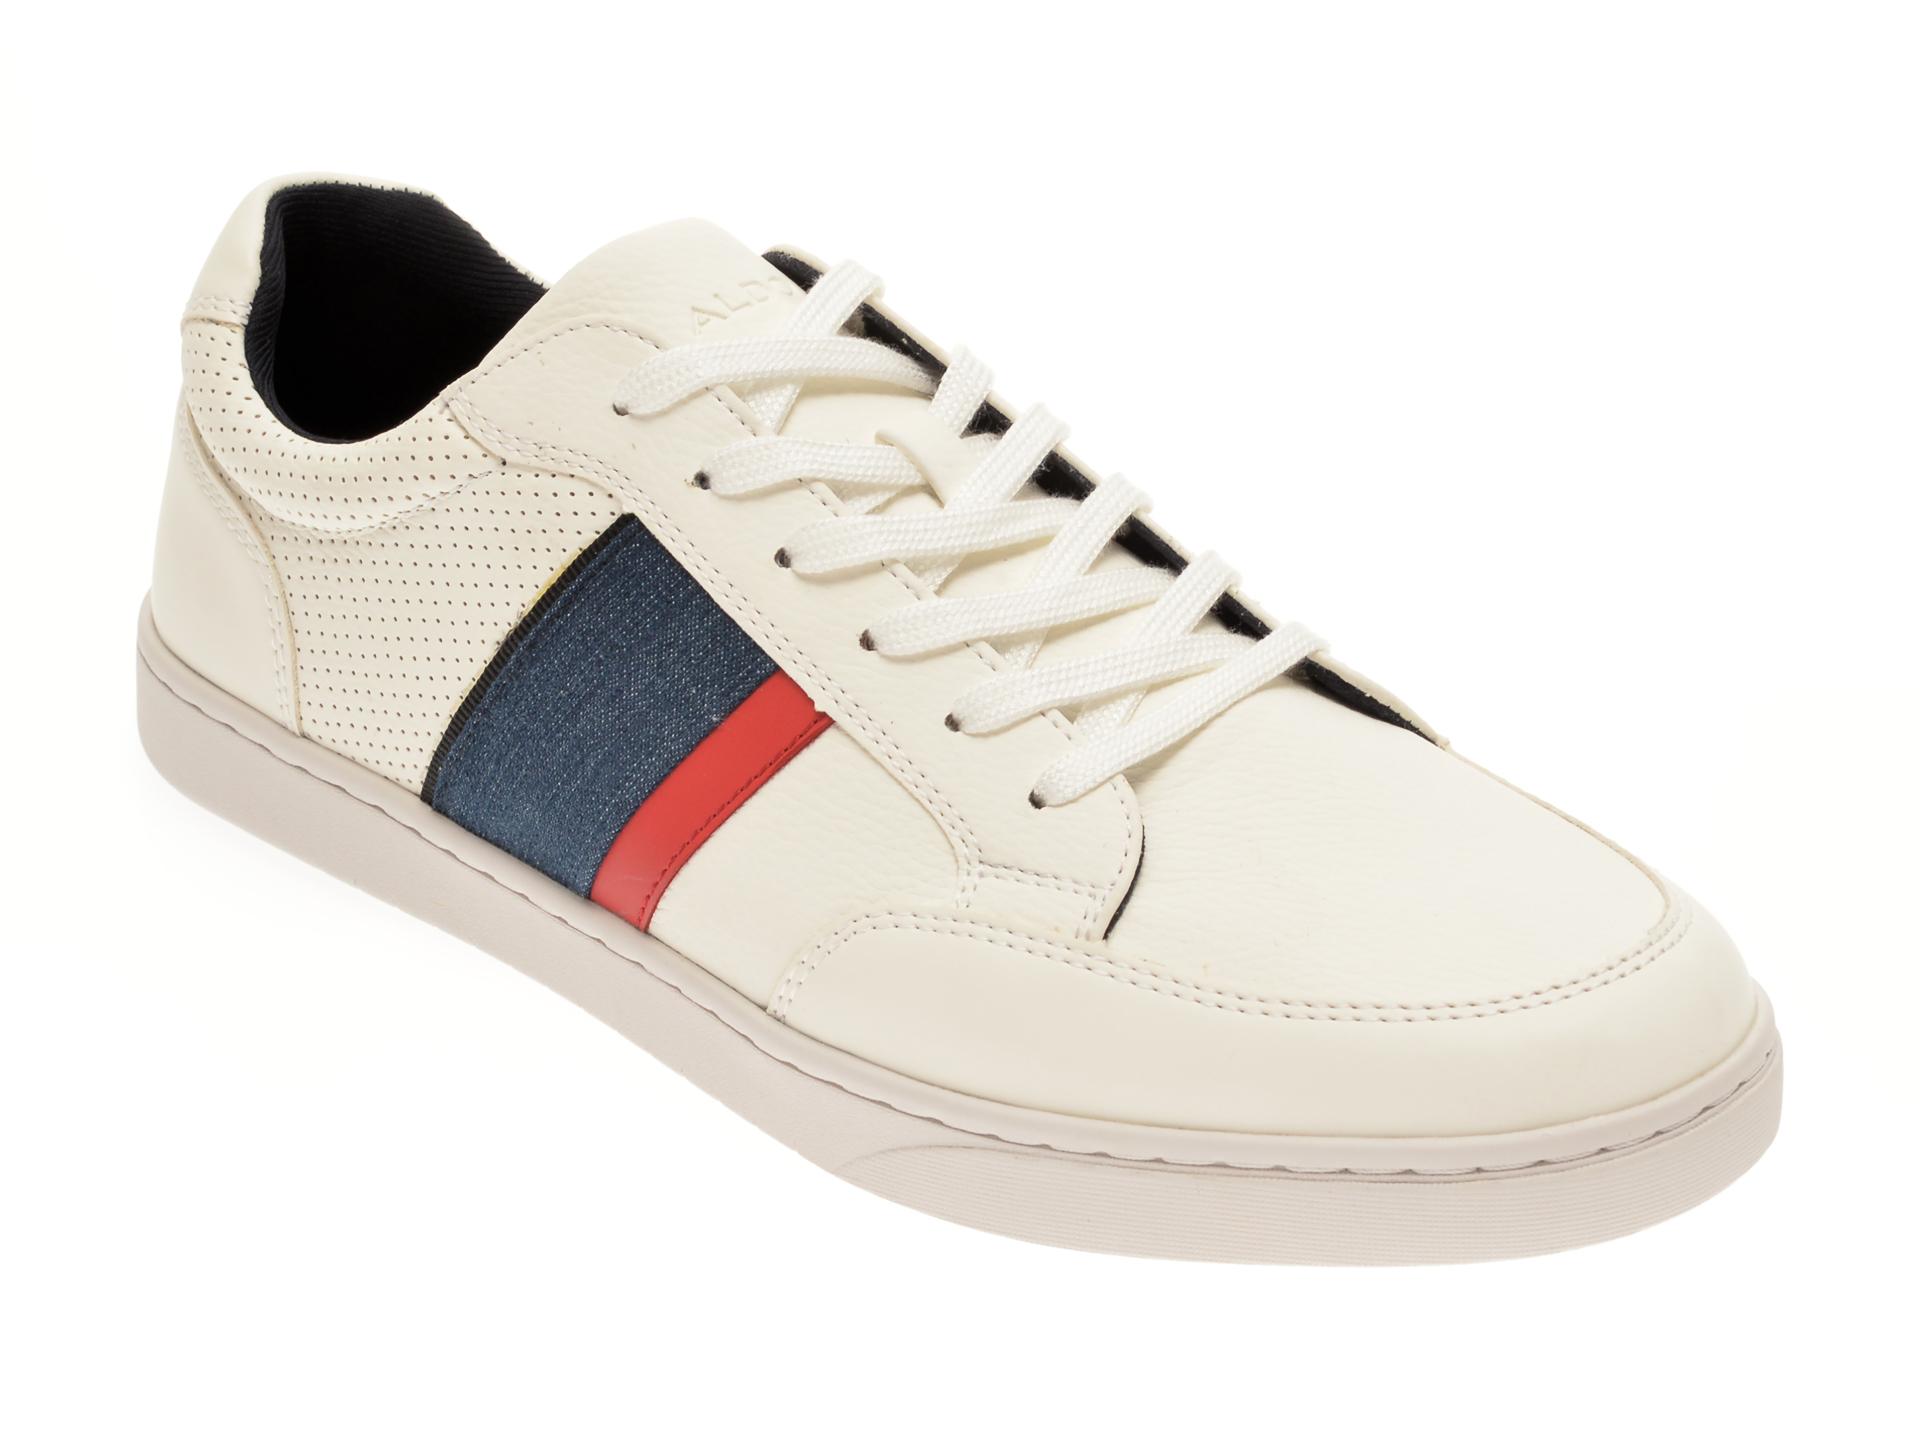 Pantofi ALDO albi, Assimilis112, din piele ecologica New